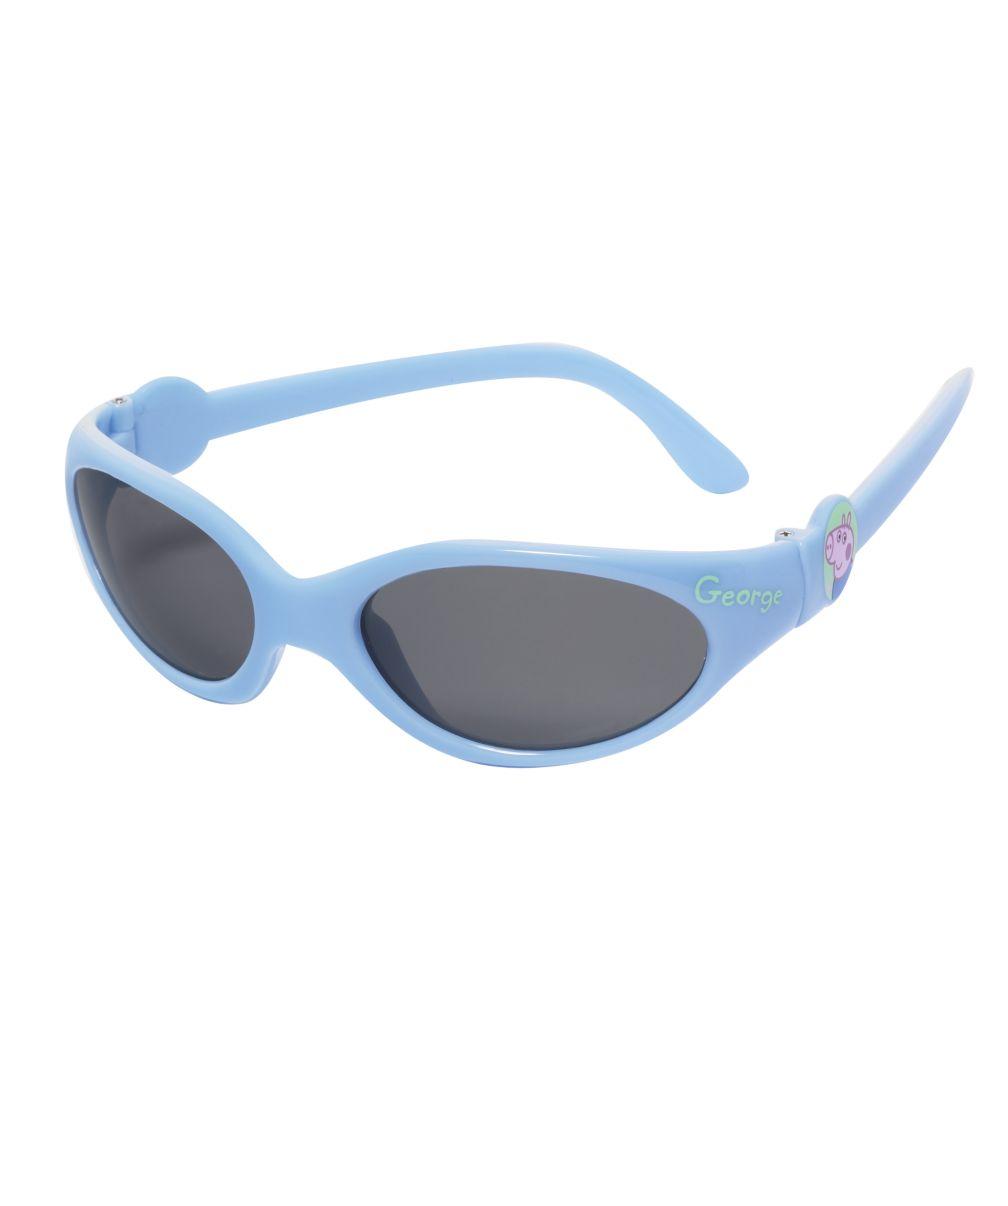 pig sunglasses sunglasses repair